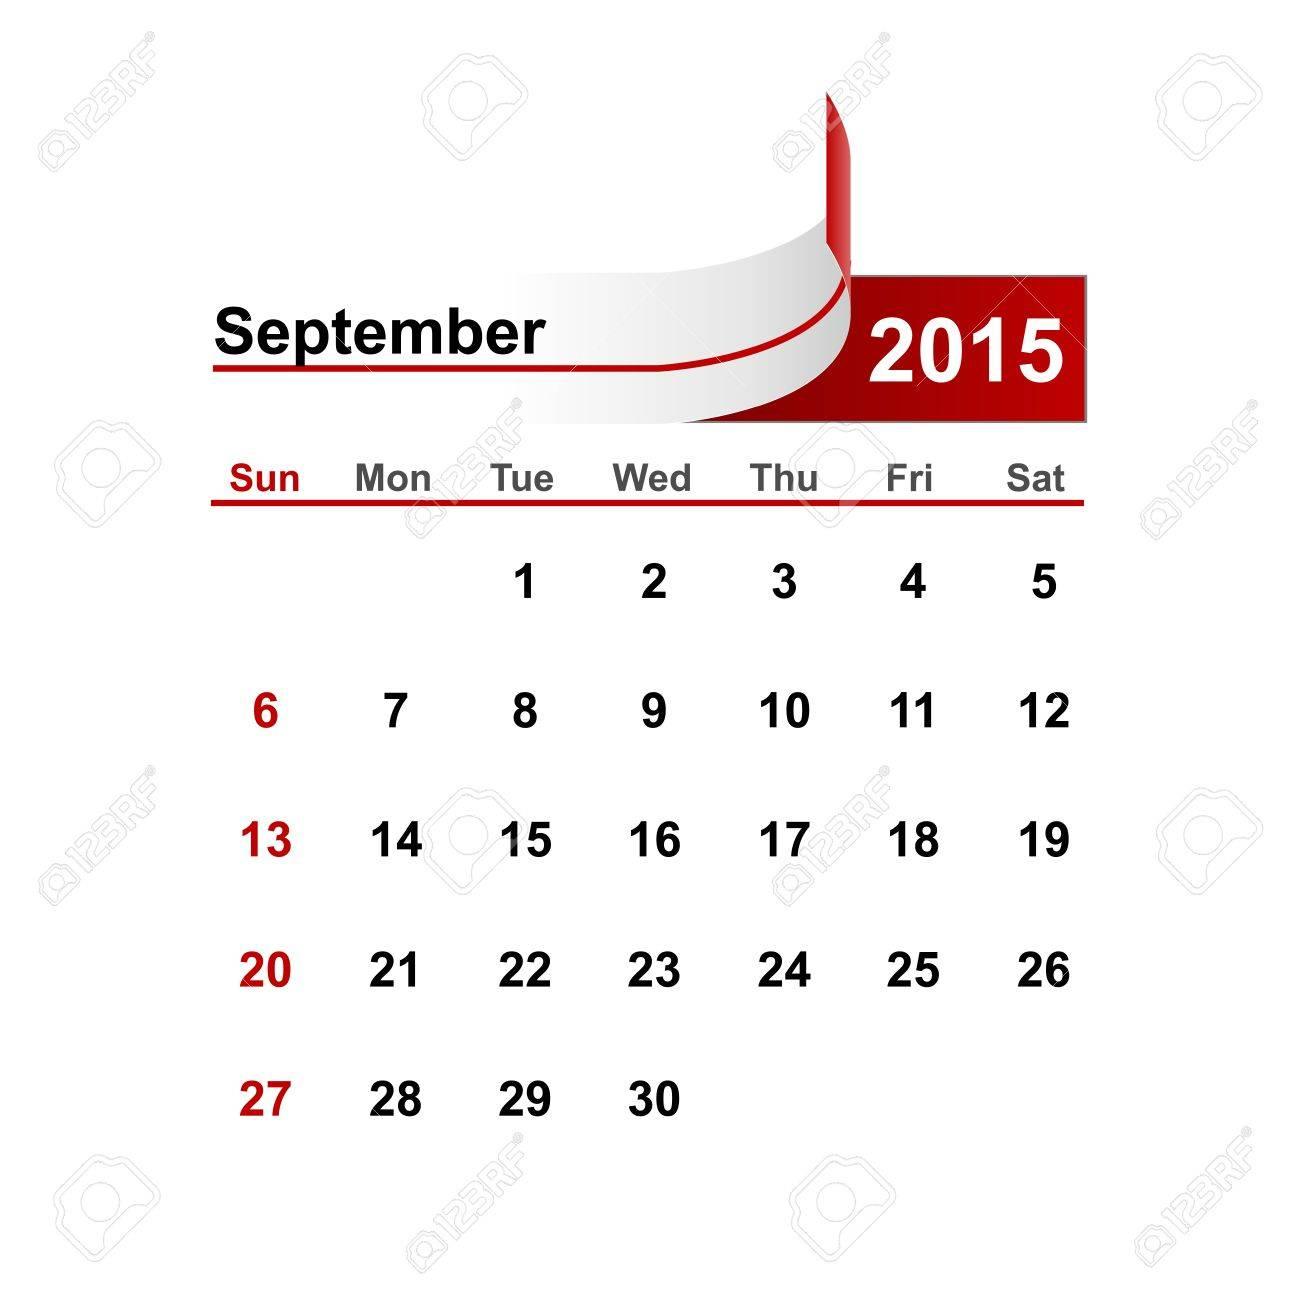 vector simple calendar 2015 year september month royalty free